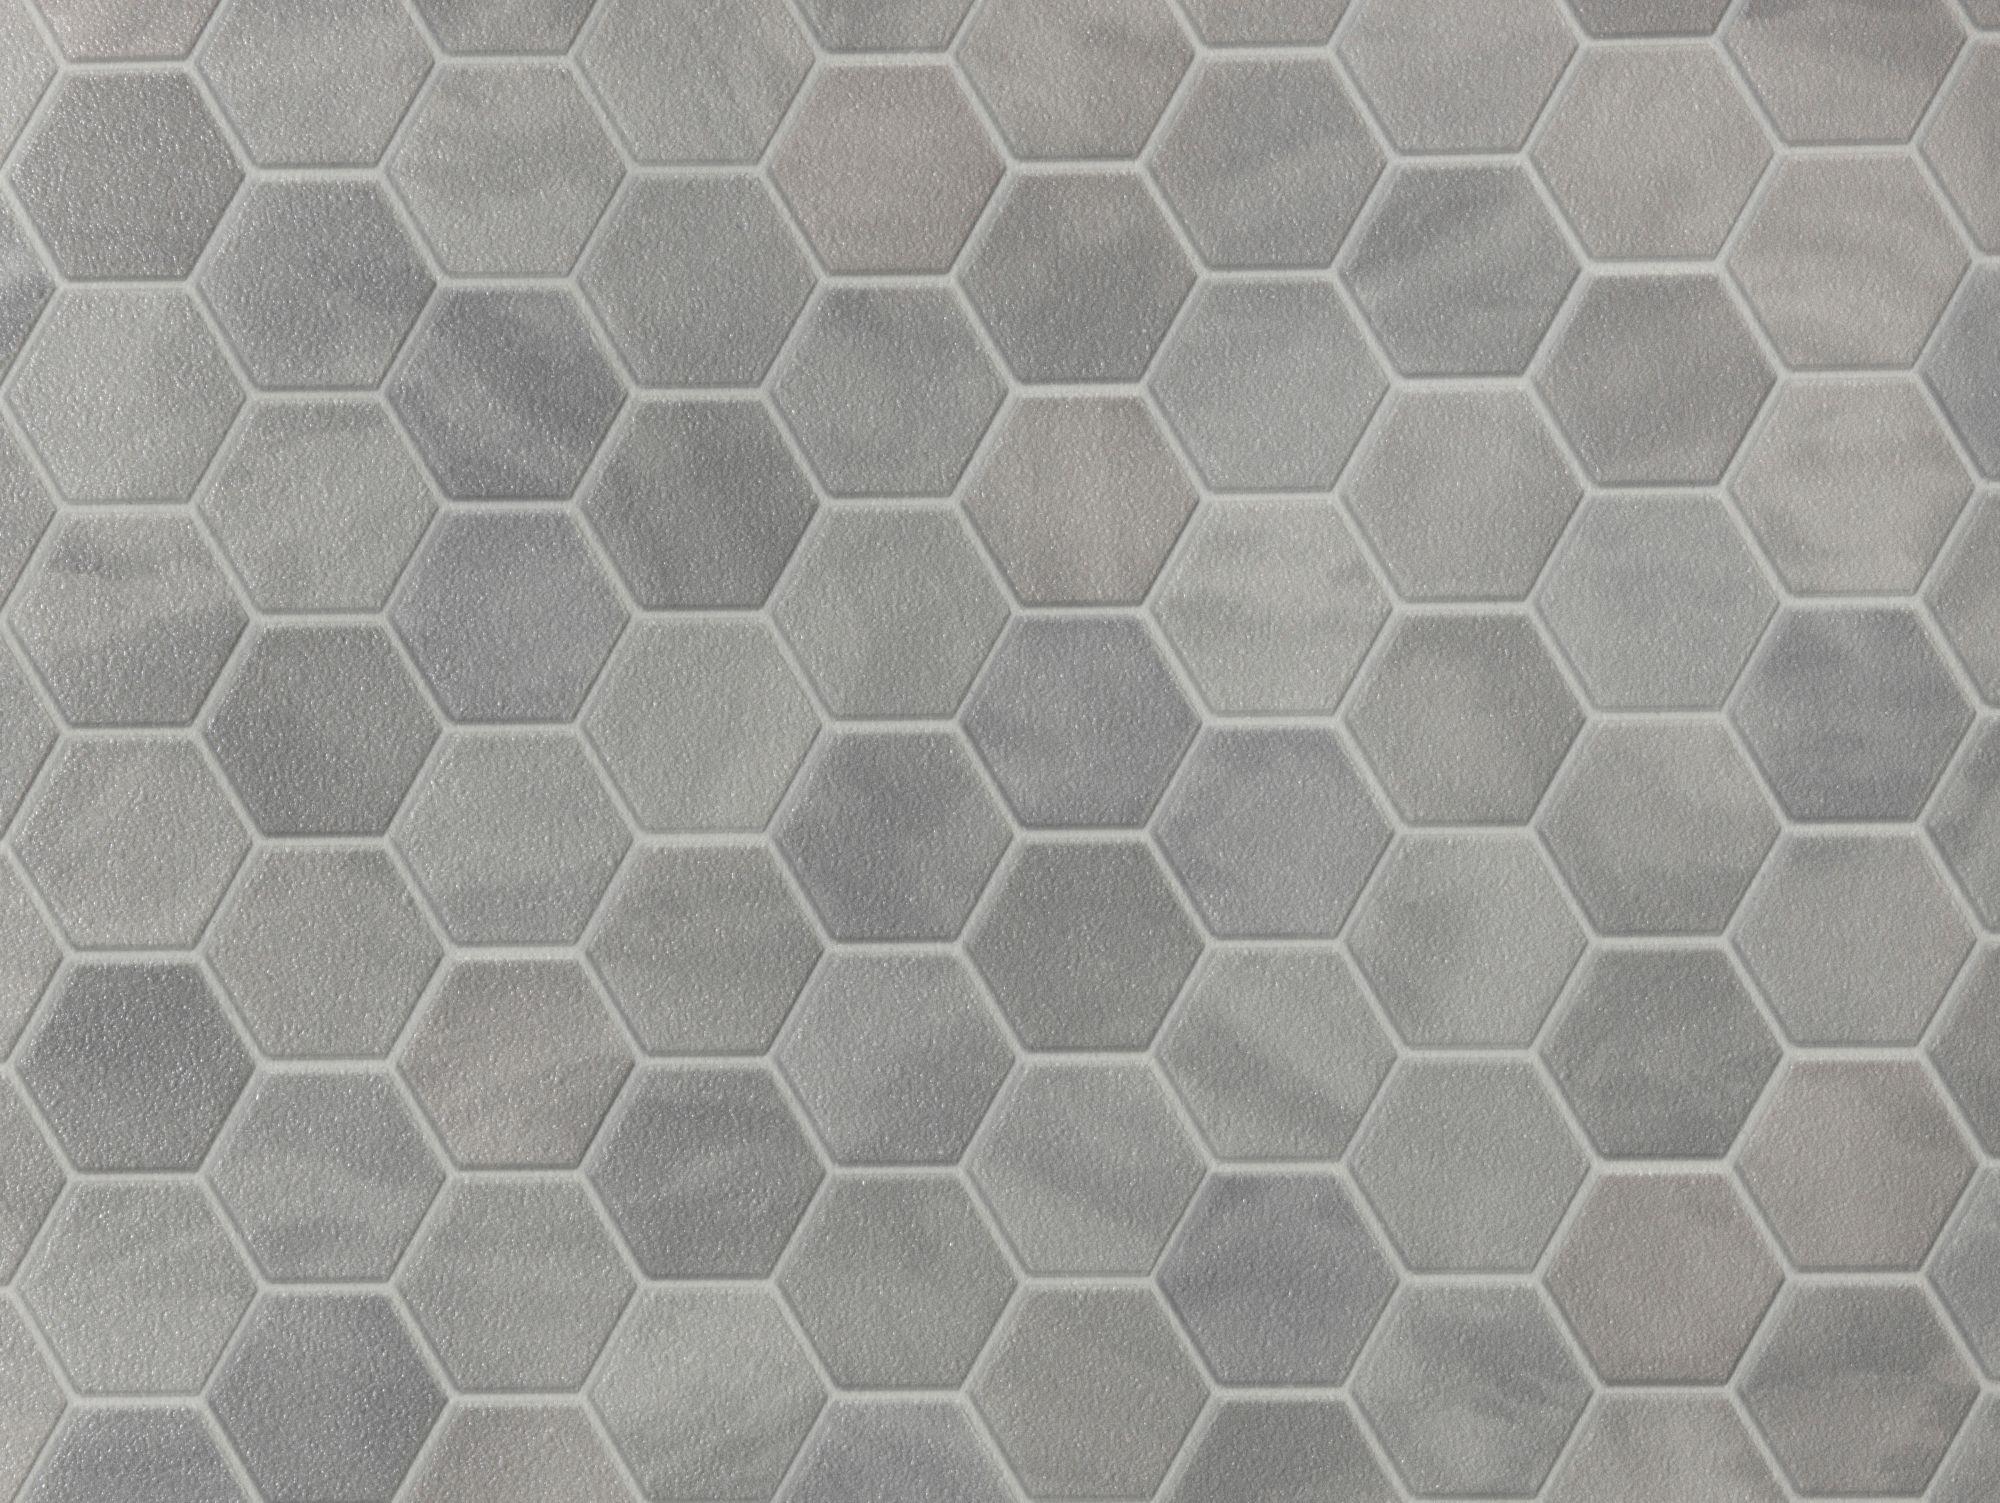 pvc boden bingo grau schwab versand vinylboden. Black Bedroom Furniture Sets. Home Design Ideas